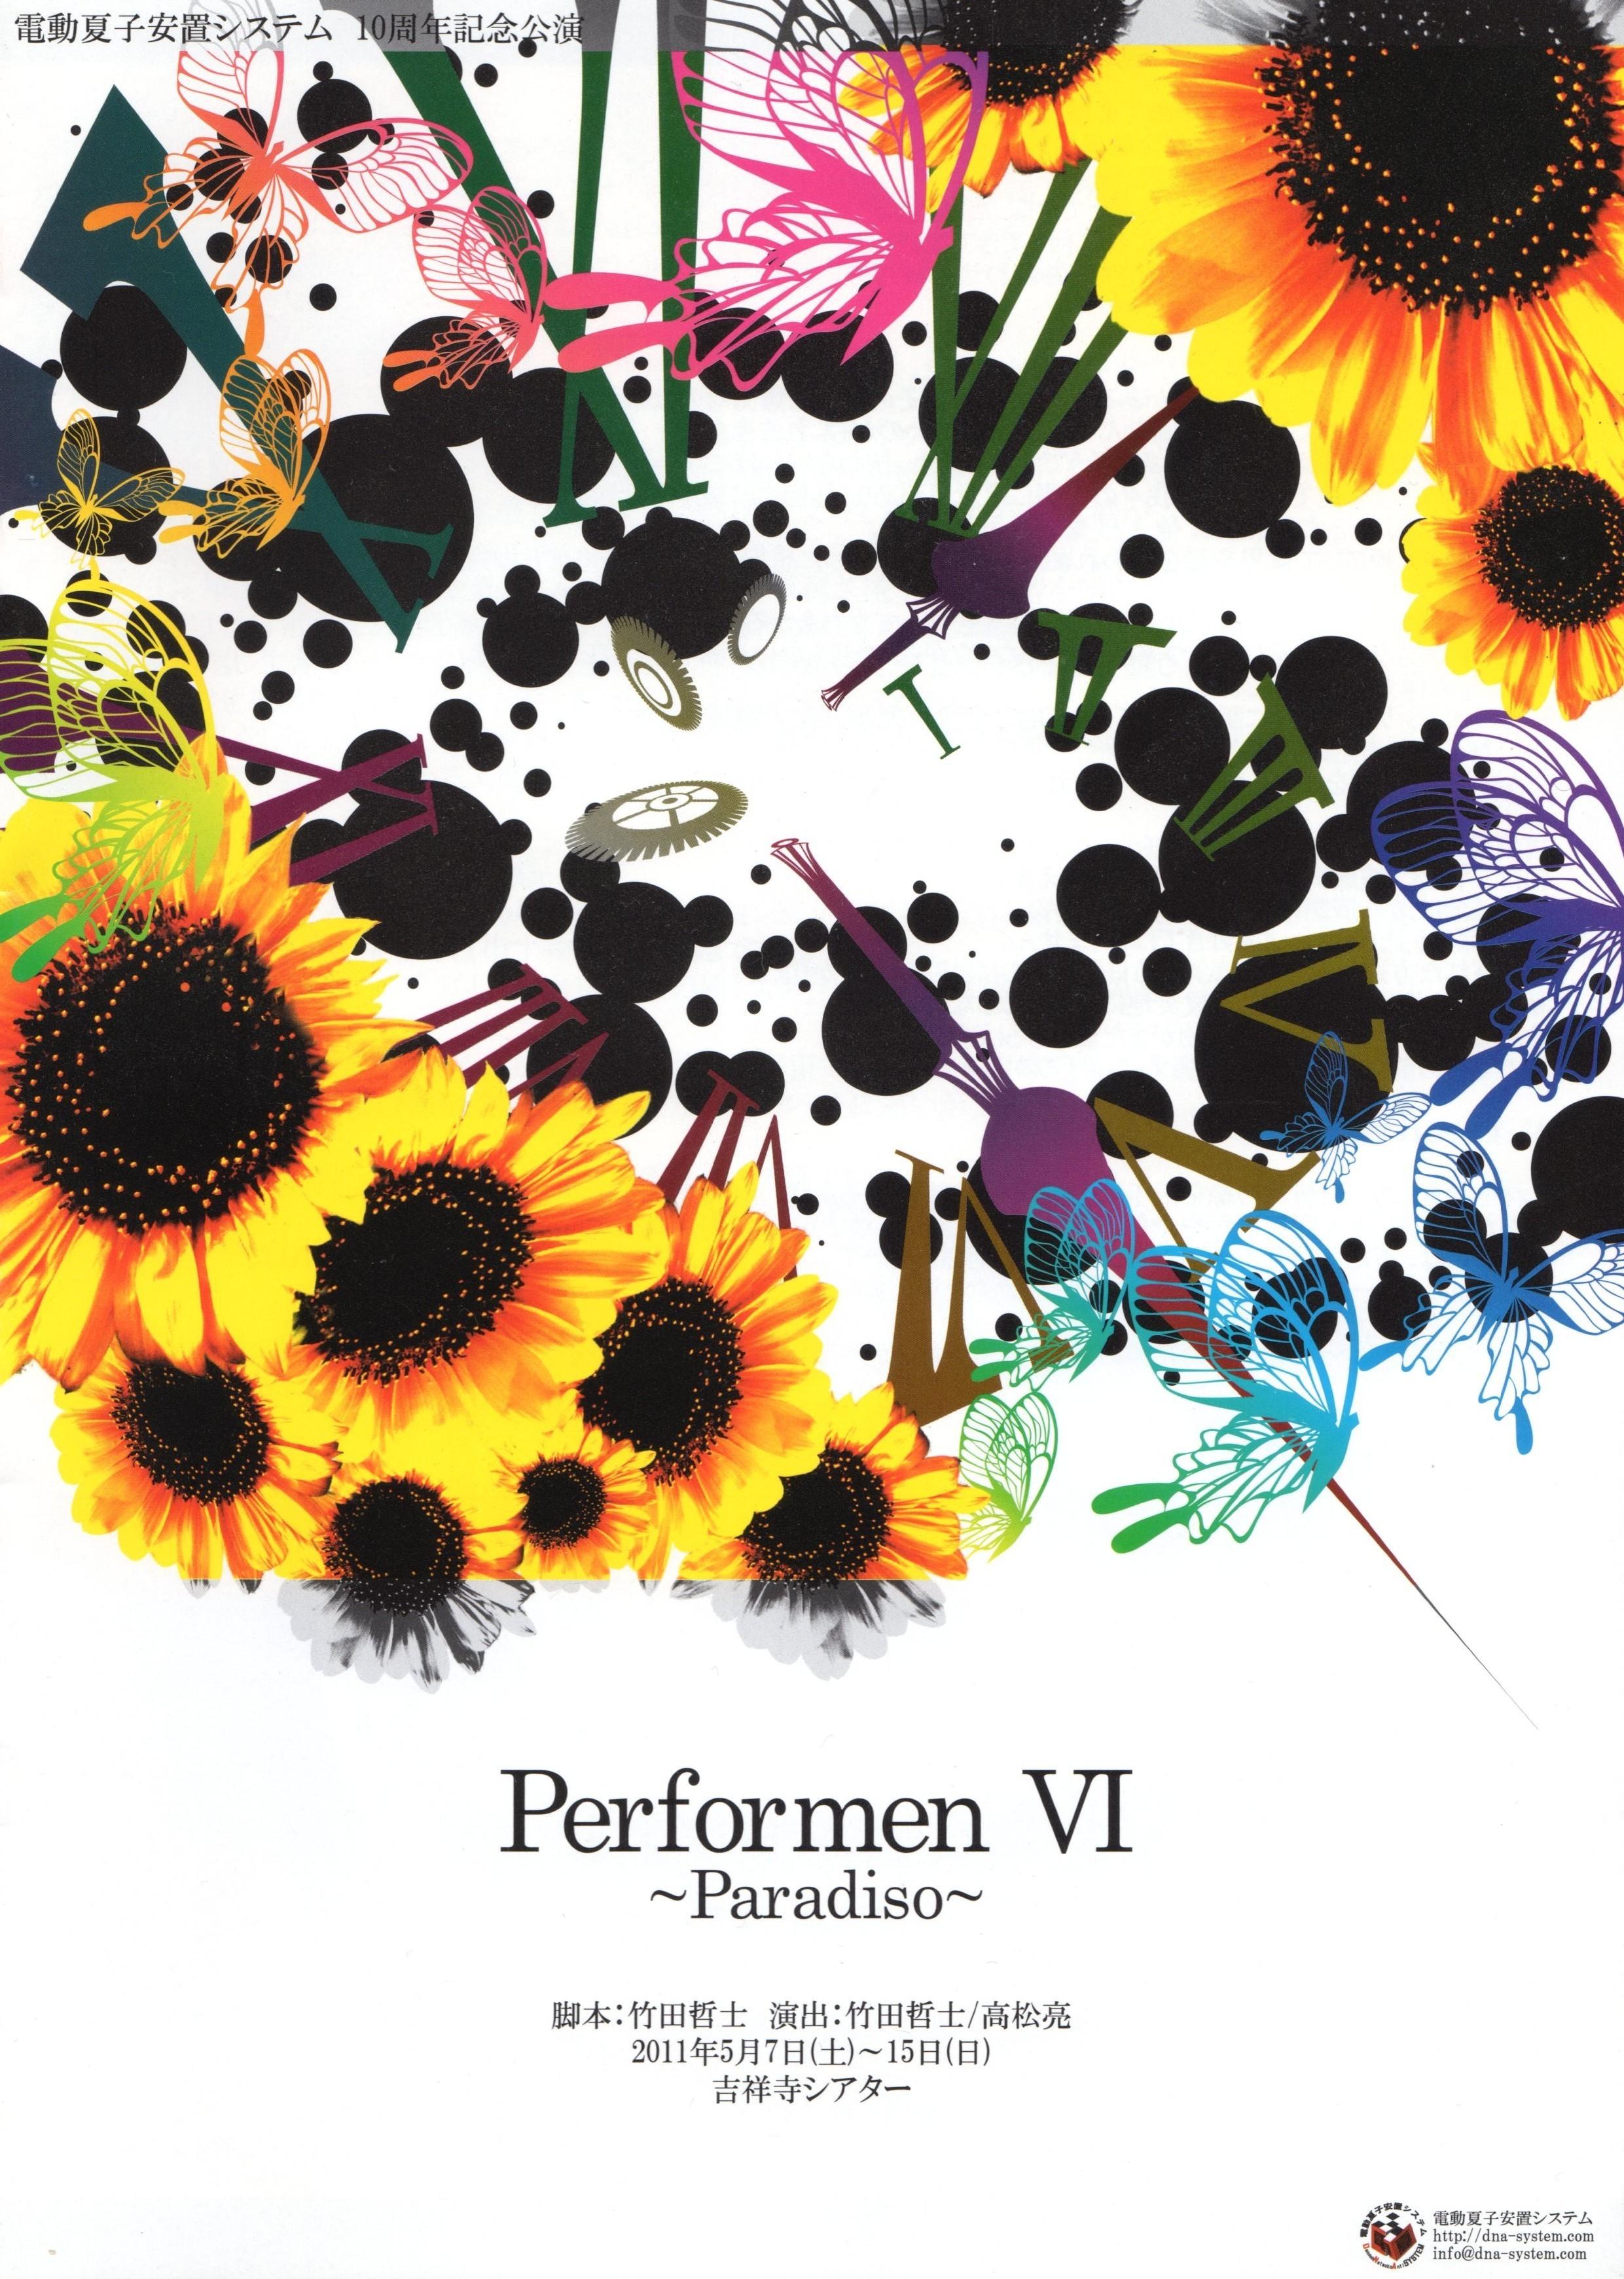 DVD 第25回公演『PerformenVI~Paradiso~』(アルテ編/ステラ編 セット)